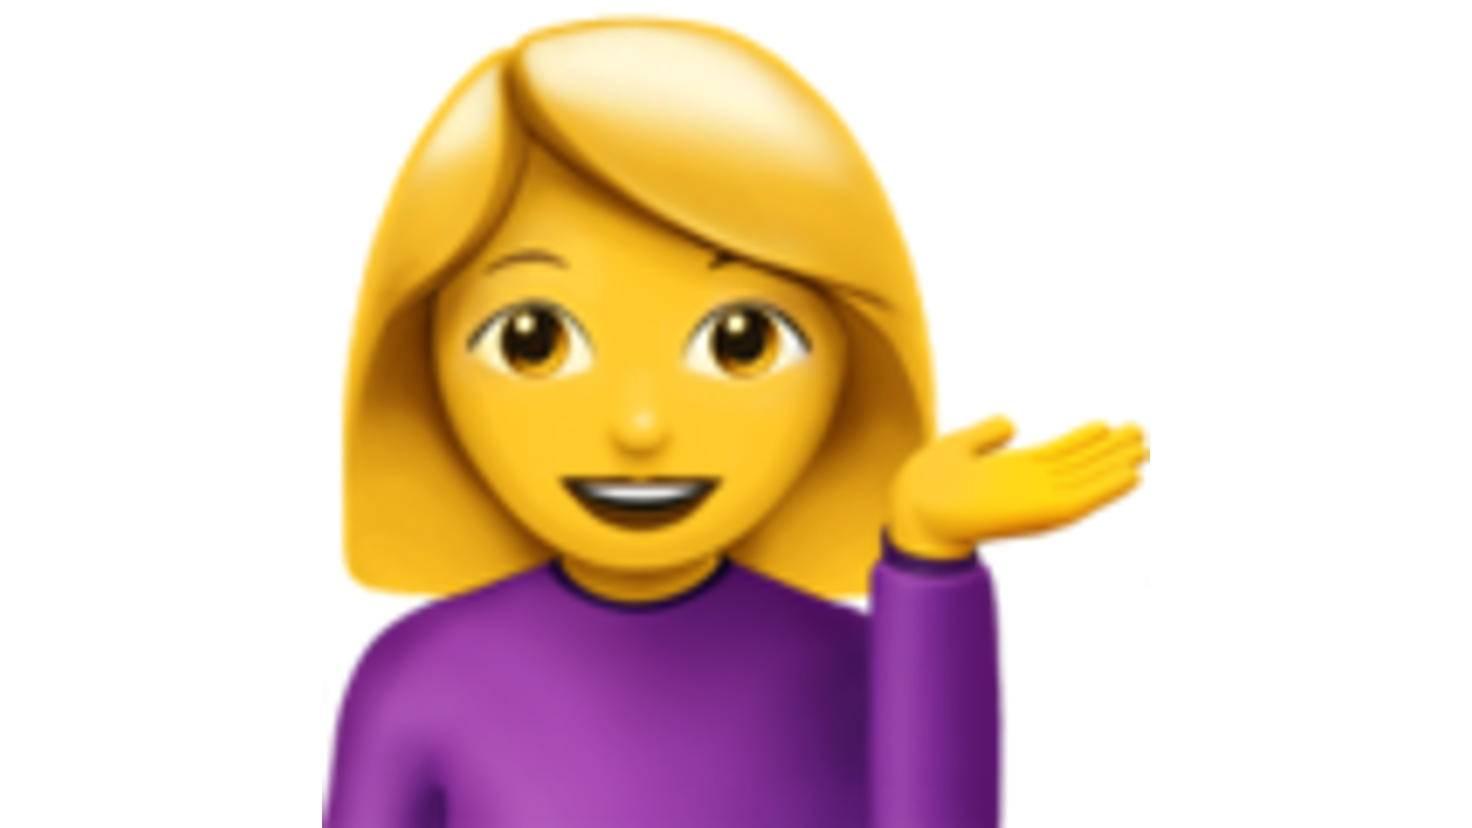 Hilfe-Emoji